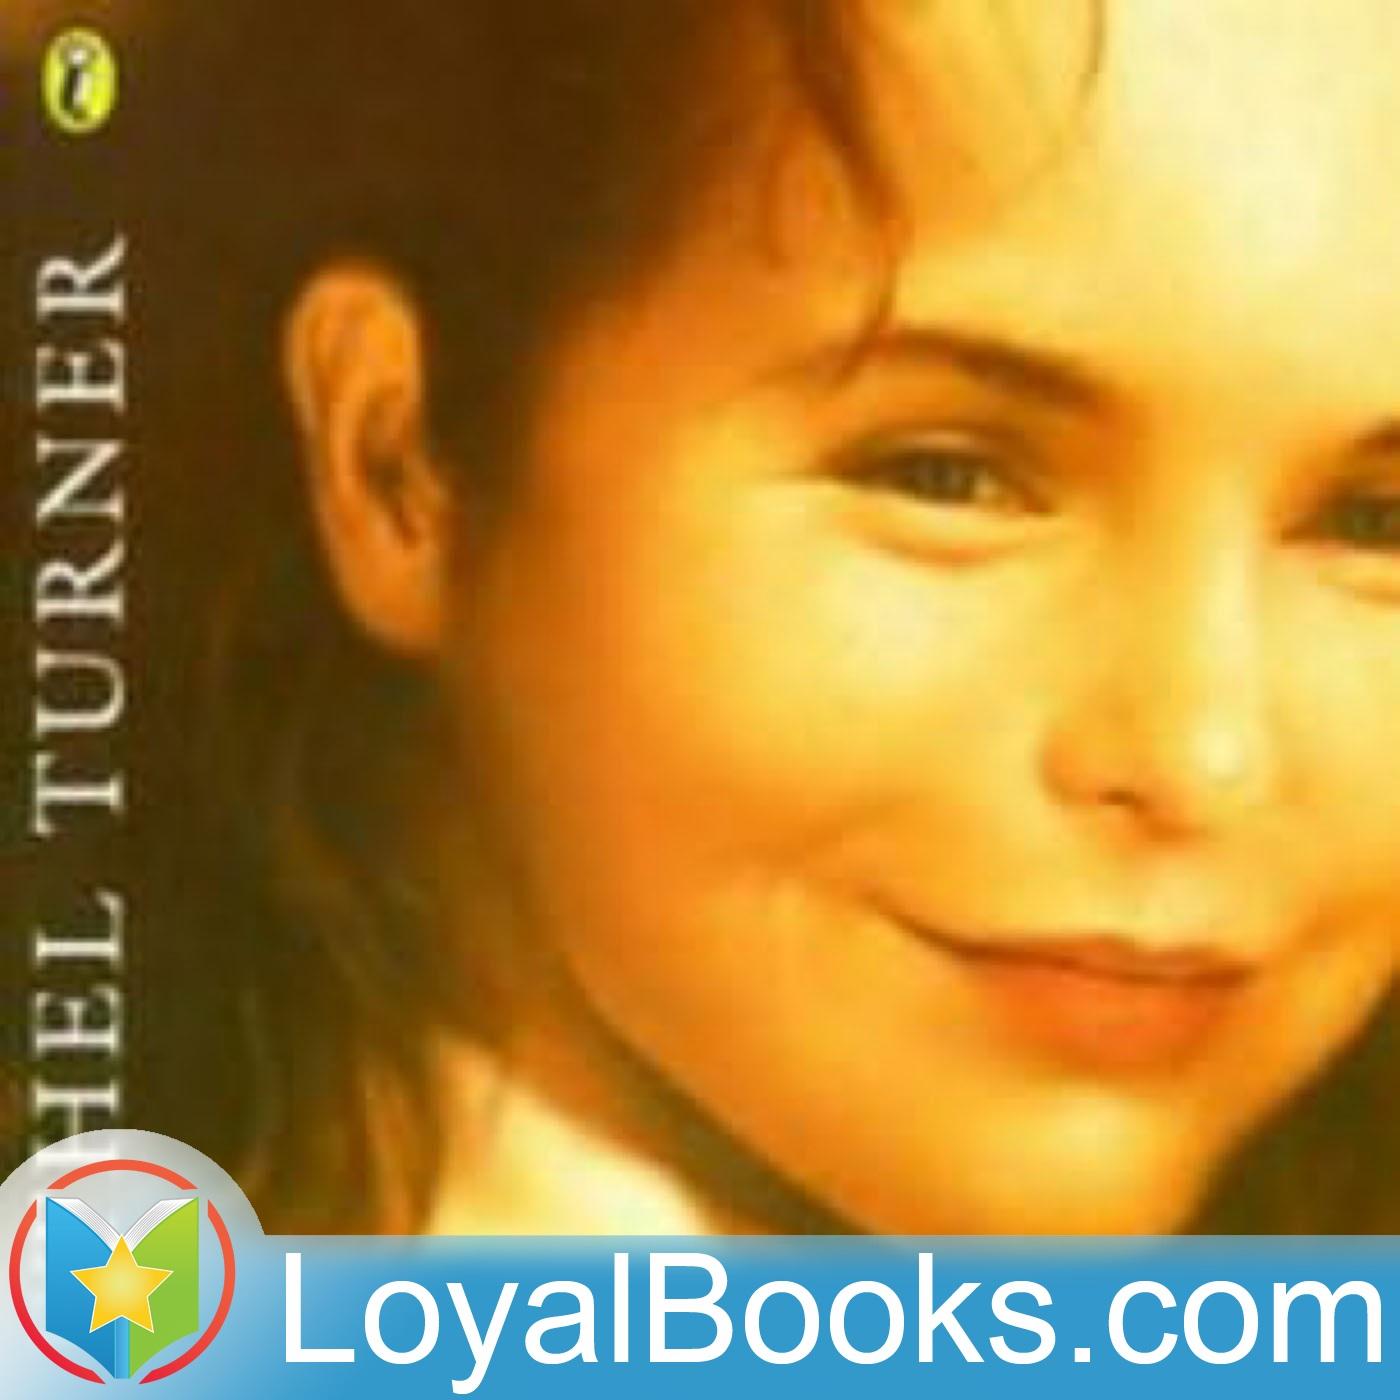 <![CDATA[Seven Little Australians by Ethel Sybil Turner]]>